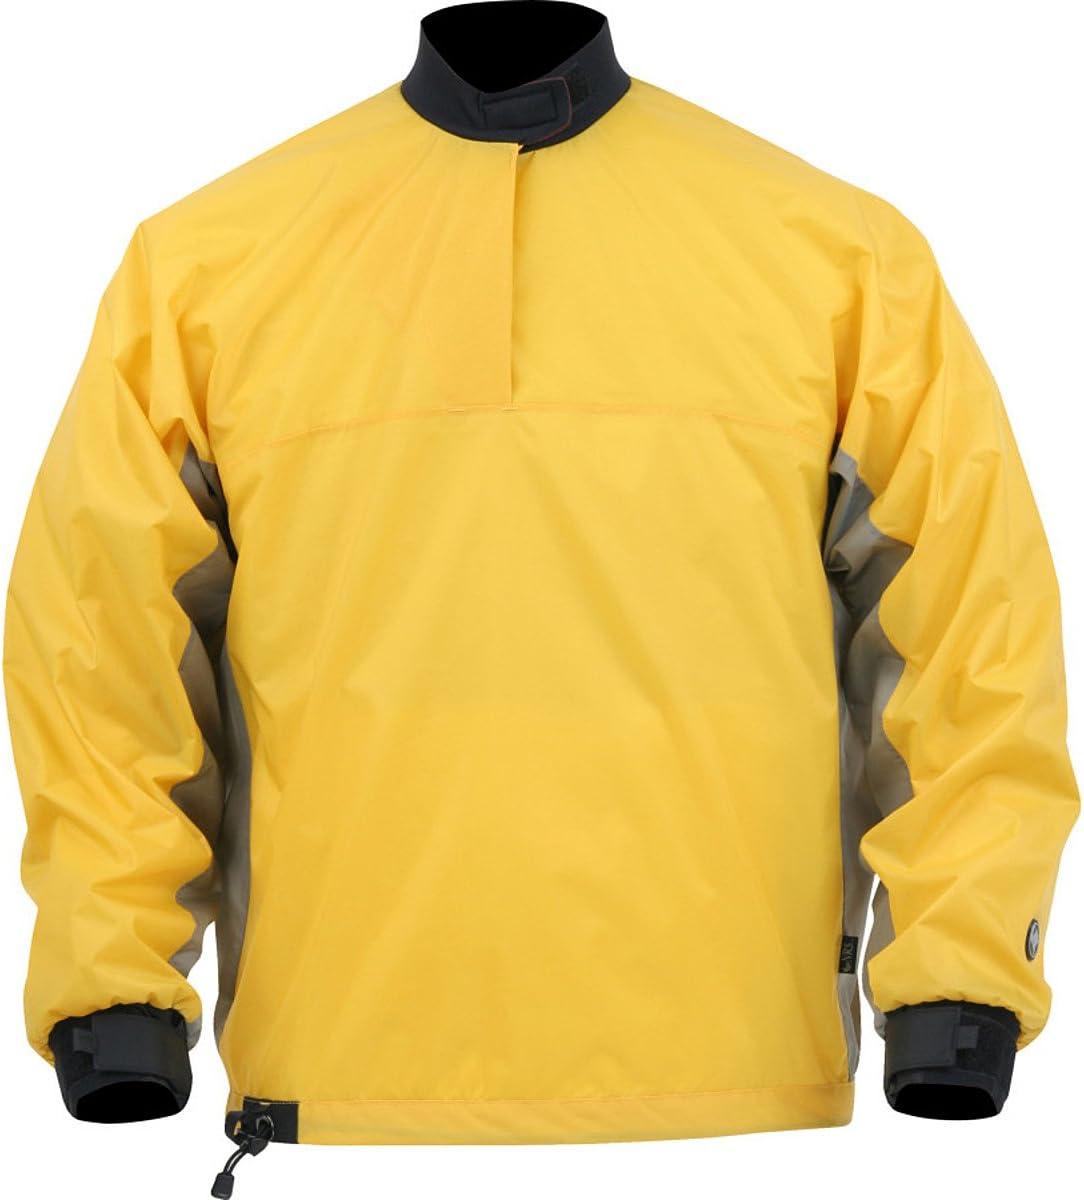 NRS Rio Top Paddle Jacket